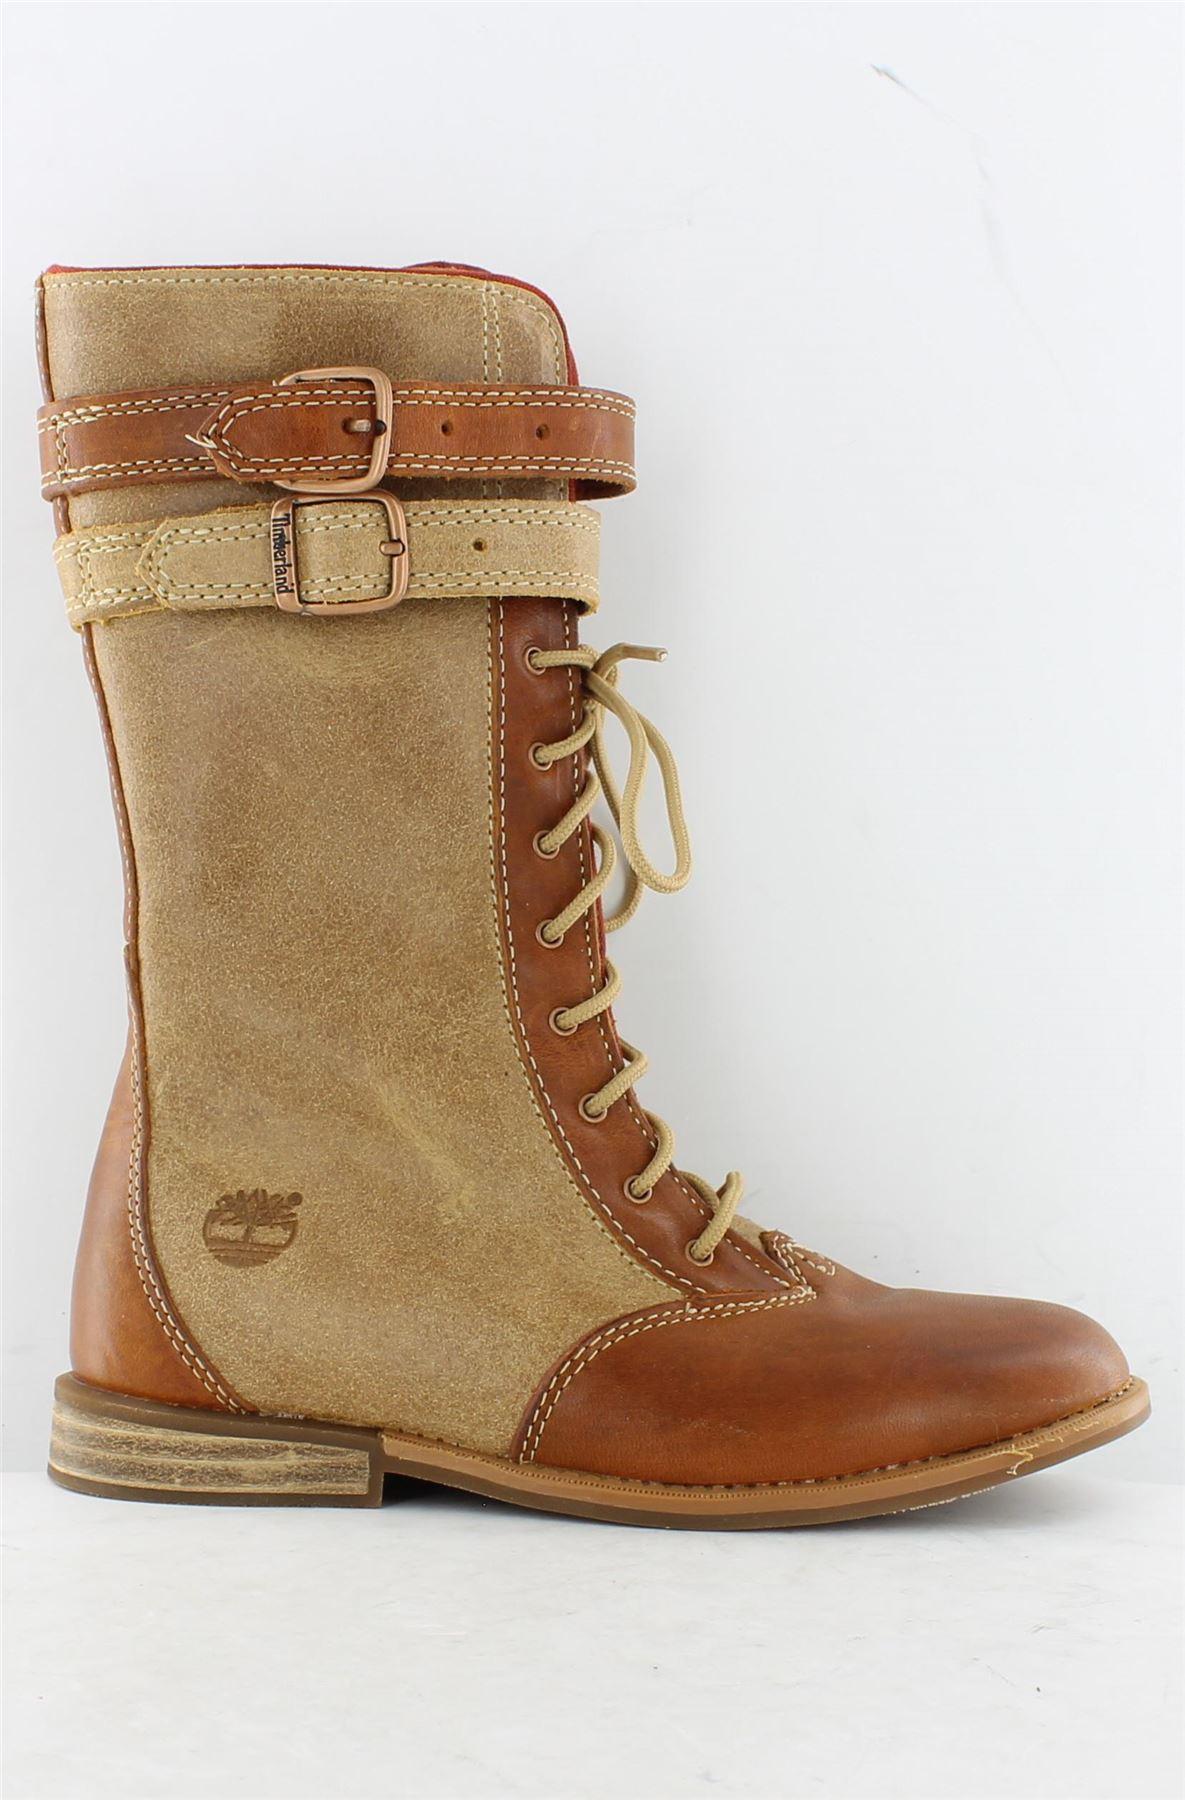 Girls Timberland Long Boots 039 31716 039 Factory